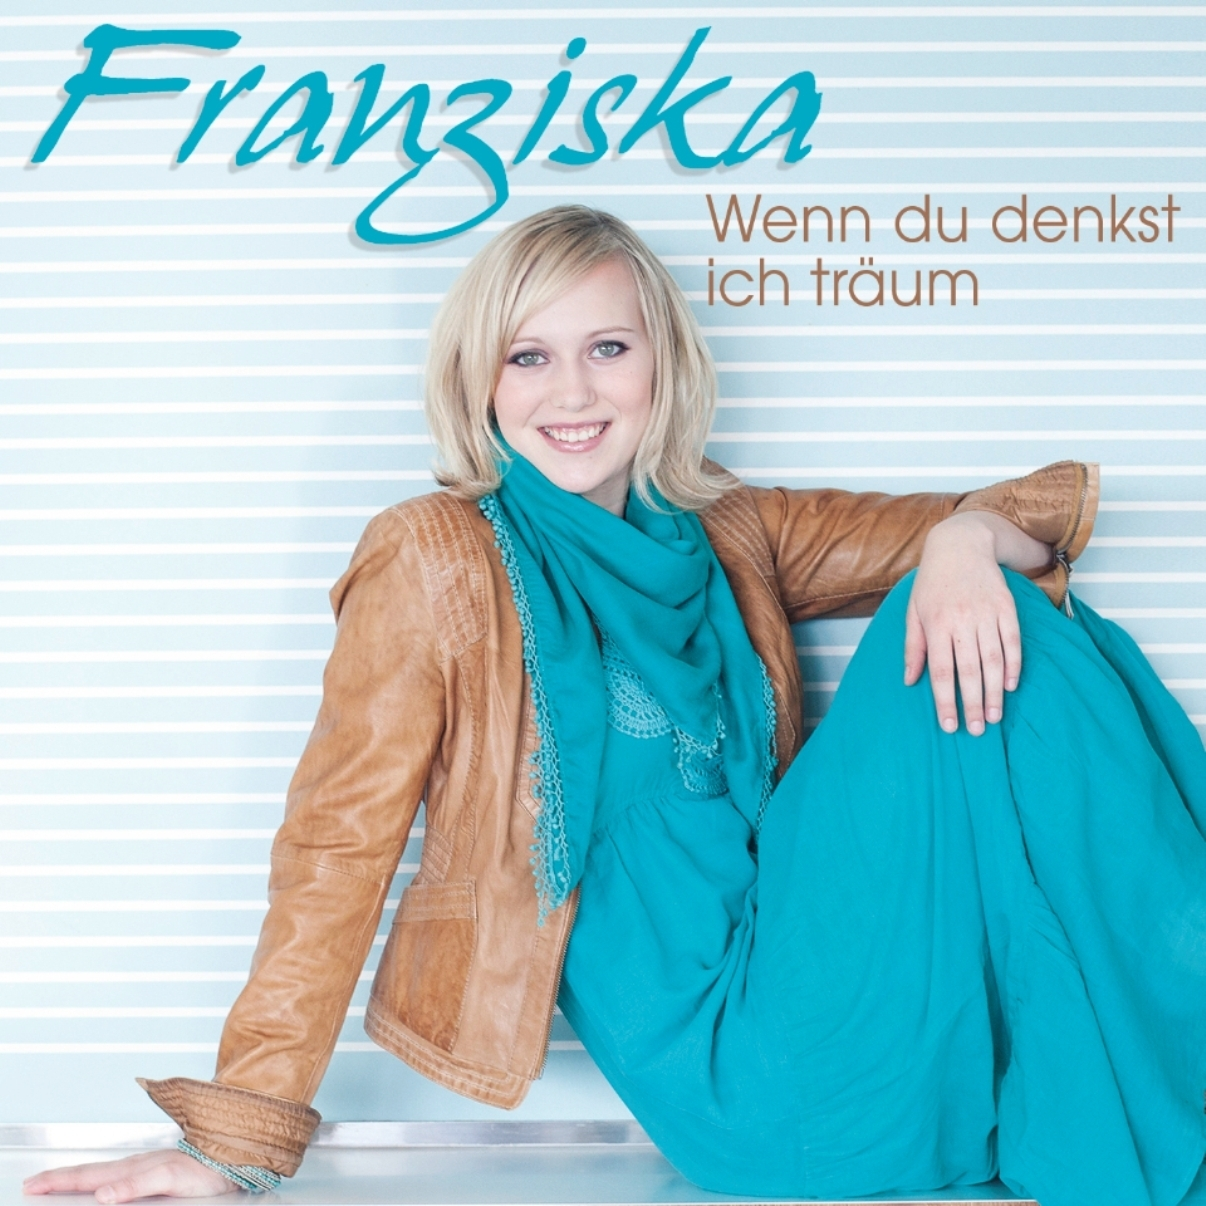 Cover: Wenn du denkst ich träum, Franziska